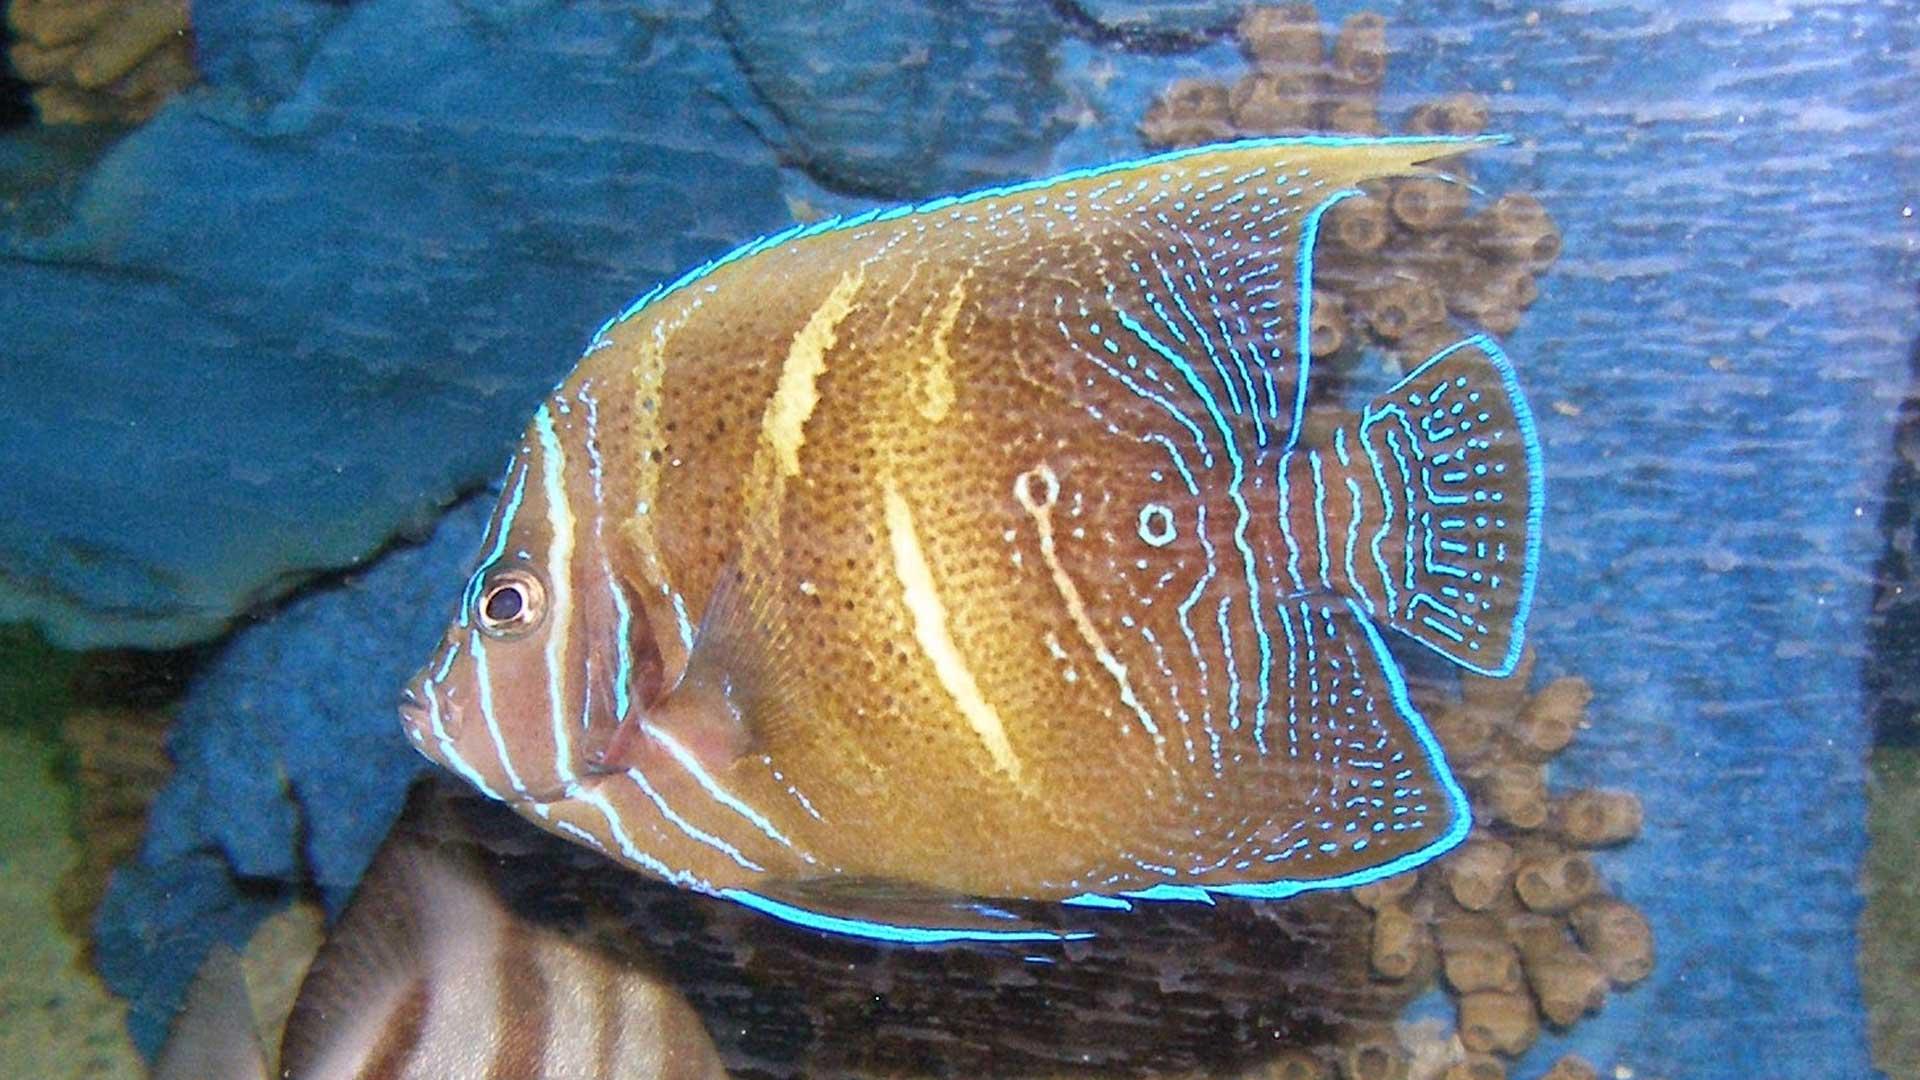 Figure 4.  Angelfish (~2 years old) on display at SeaWorld San Antonio. Figure 4 and 5 are the same fish.  Photo credit: Nick Ireland.